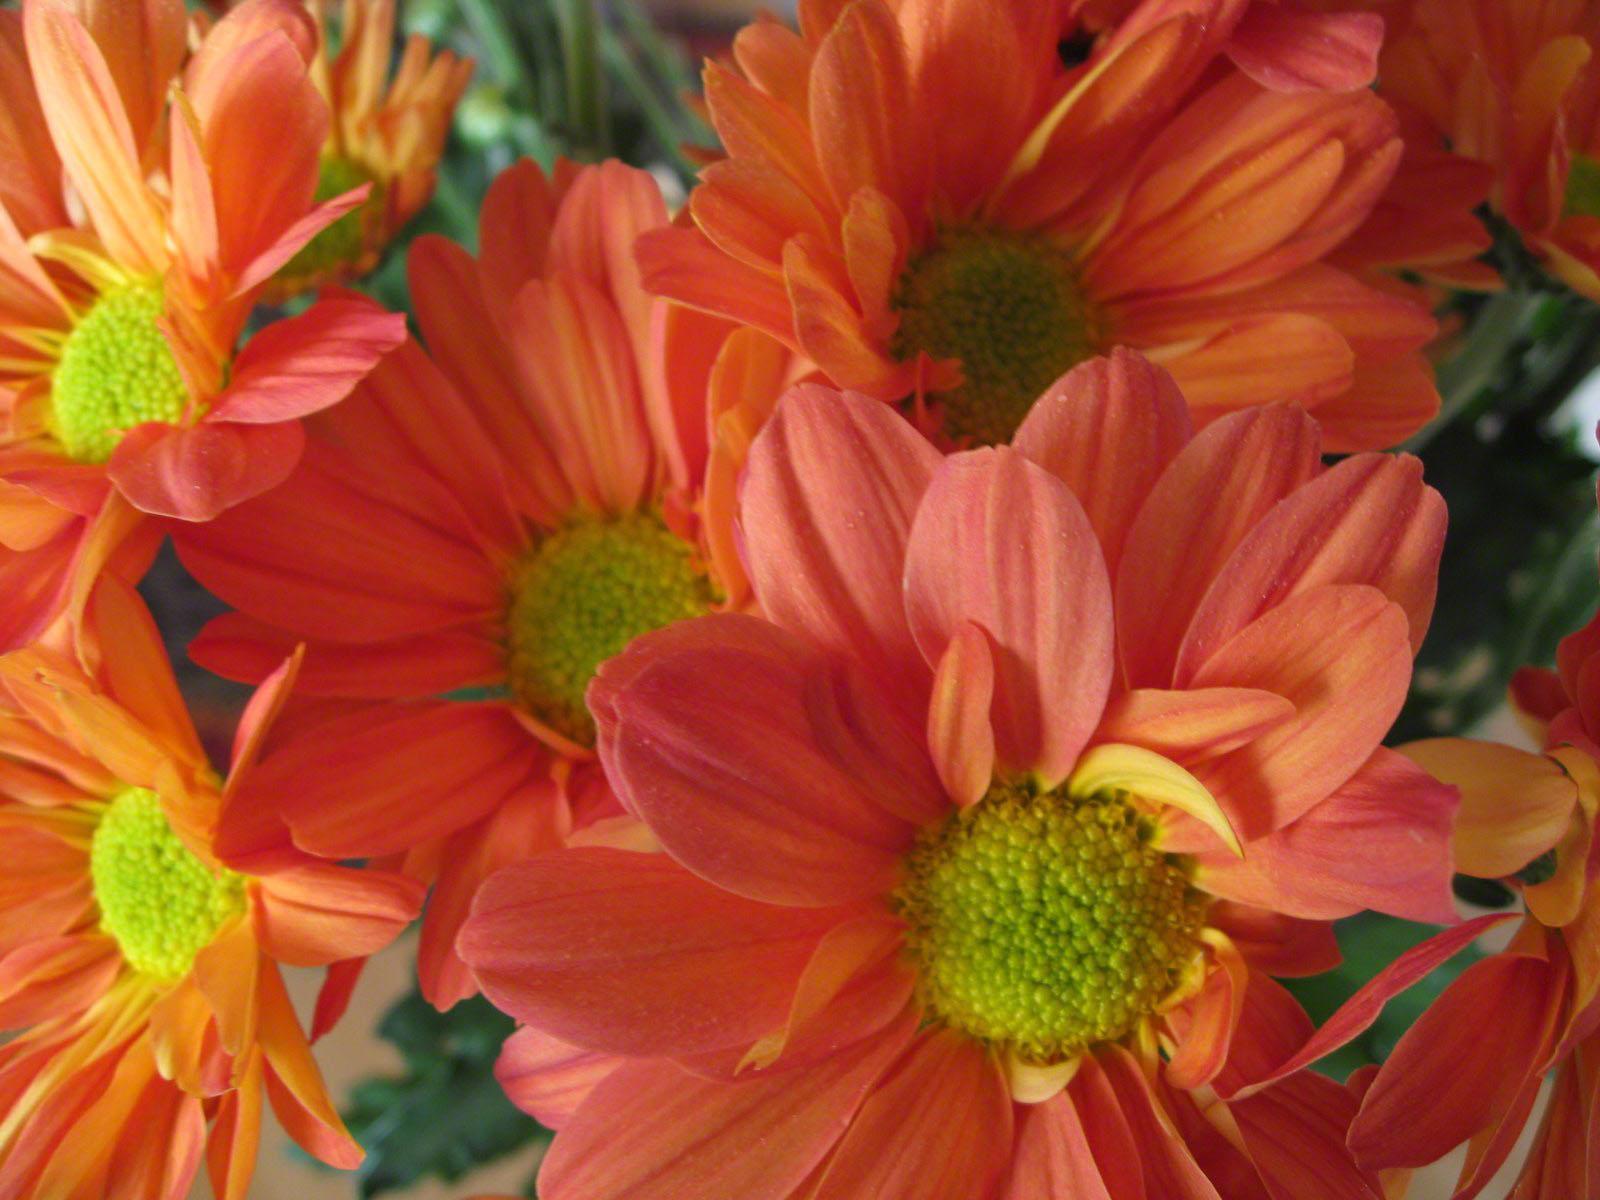 http://www.fabiovisentin.com/photography/photo/12/roses-wallpaper-roses-bouquets4407.JPG